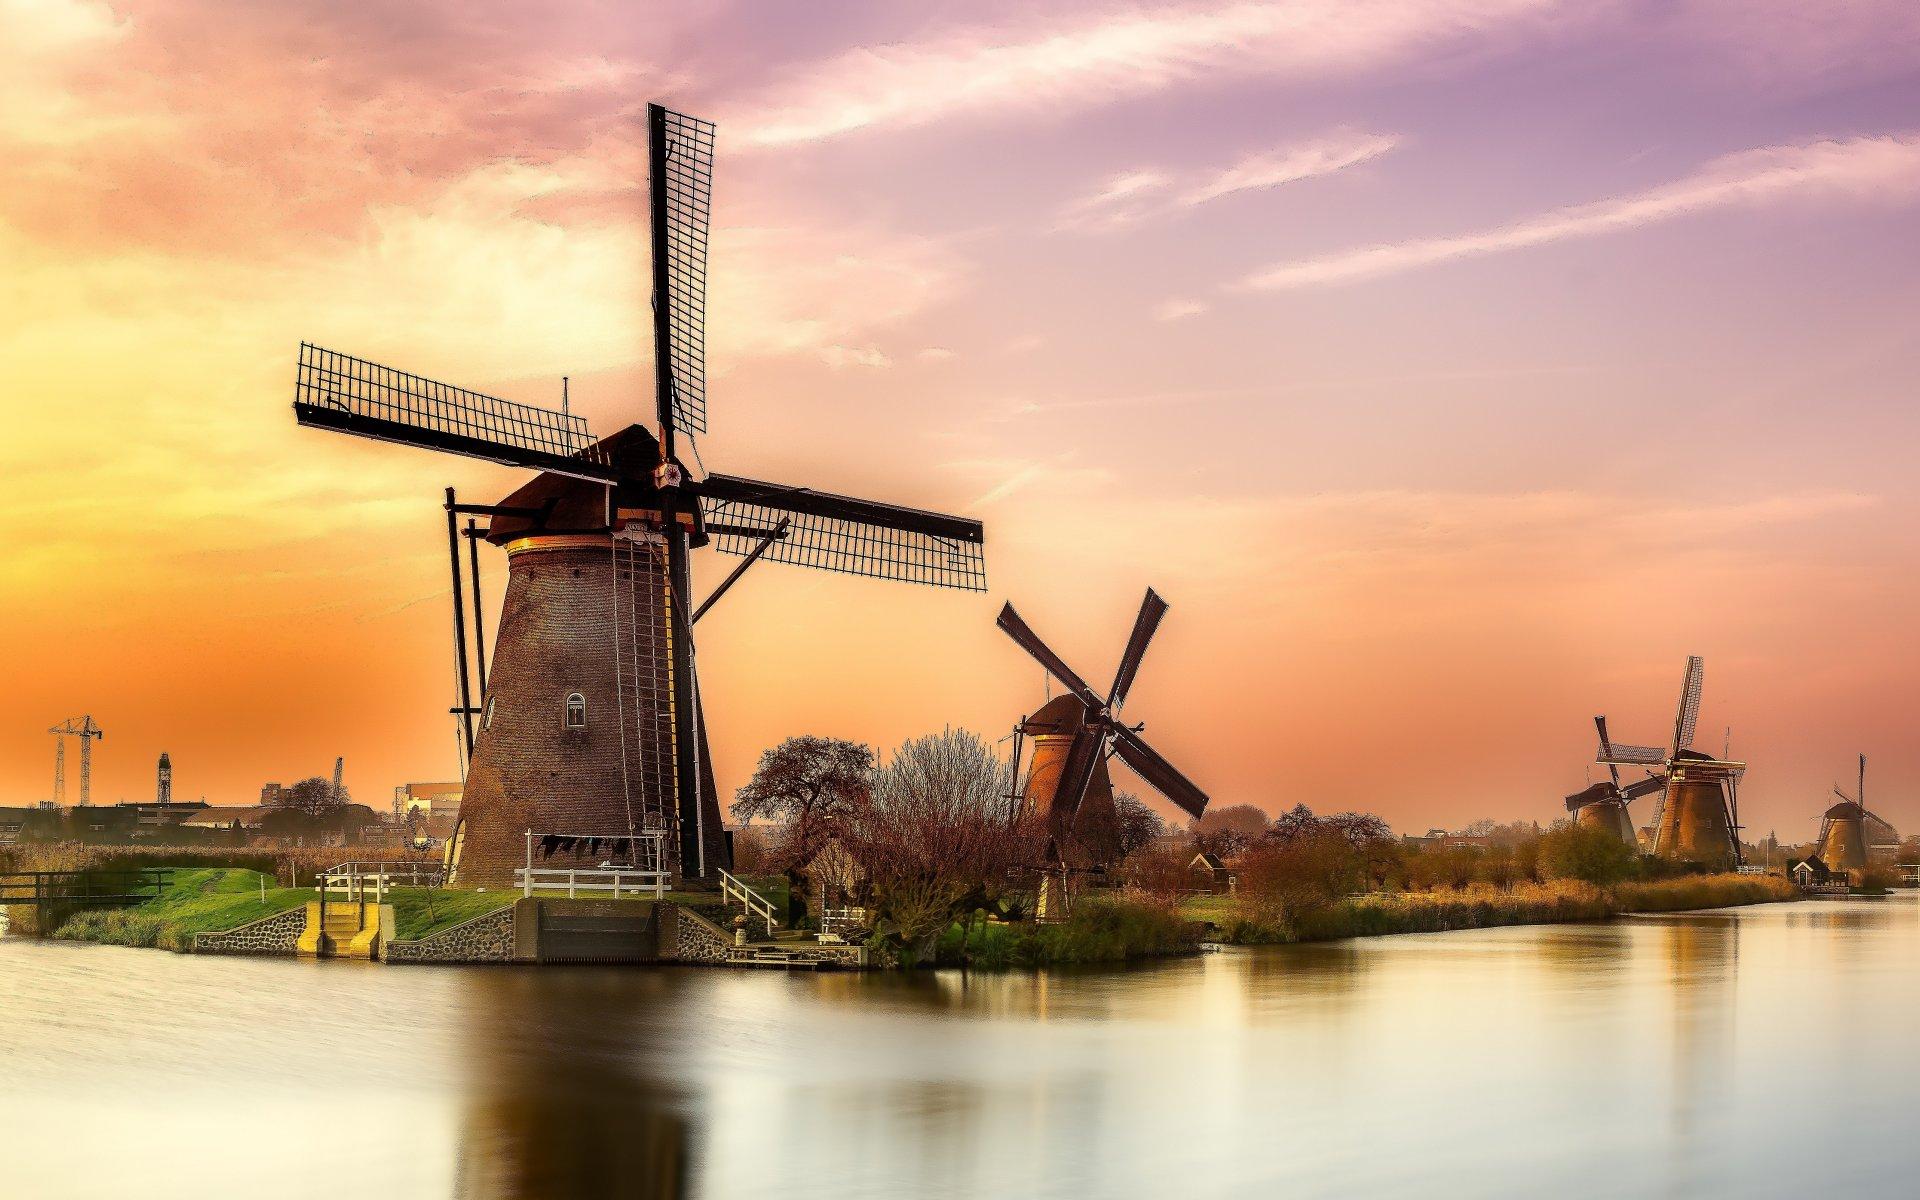 sunset_river_Holland_windmill_landscape_reflection_1920x1200